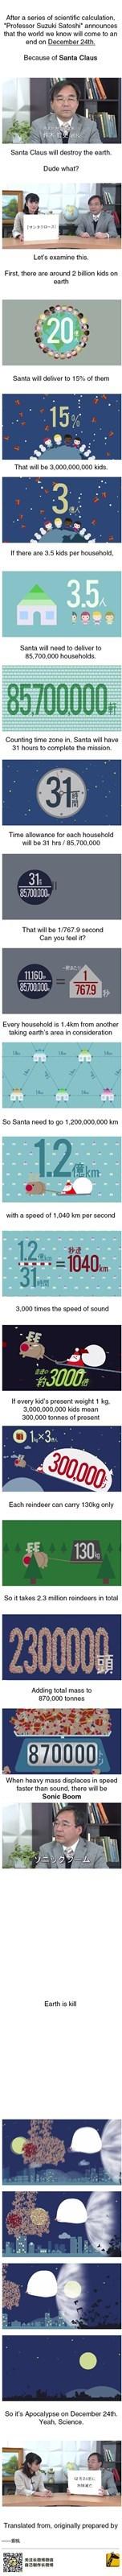 Science predicts Santa will destroy earth